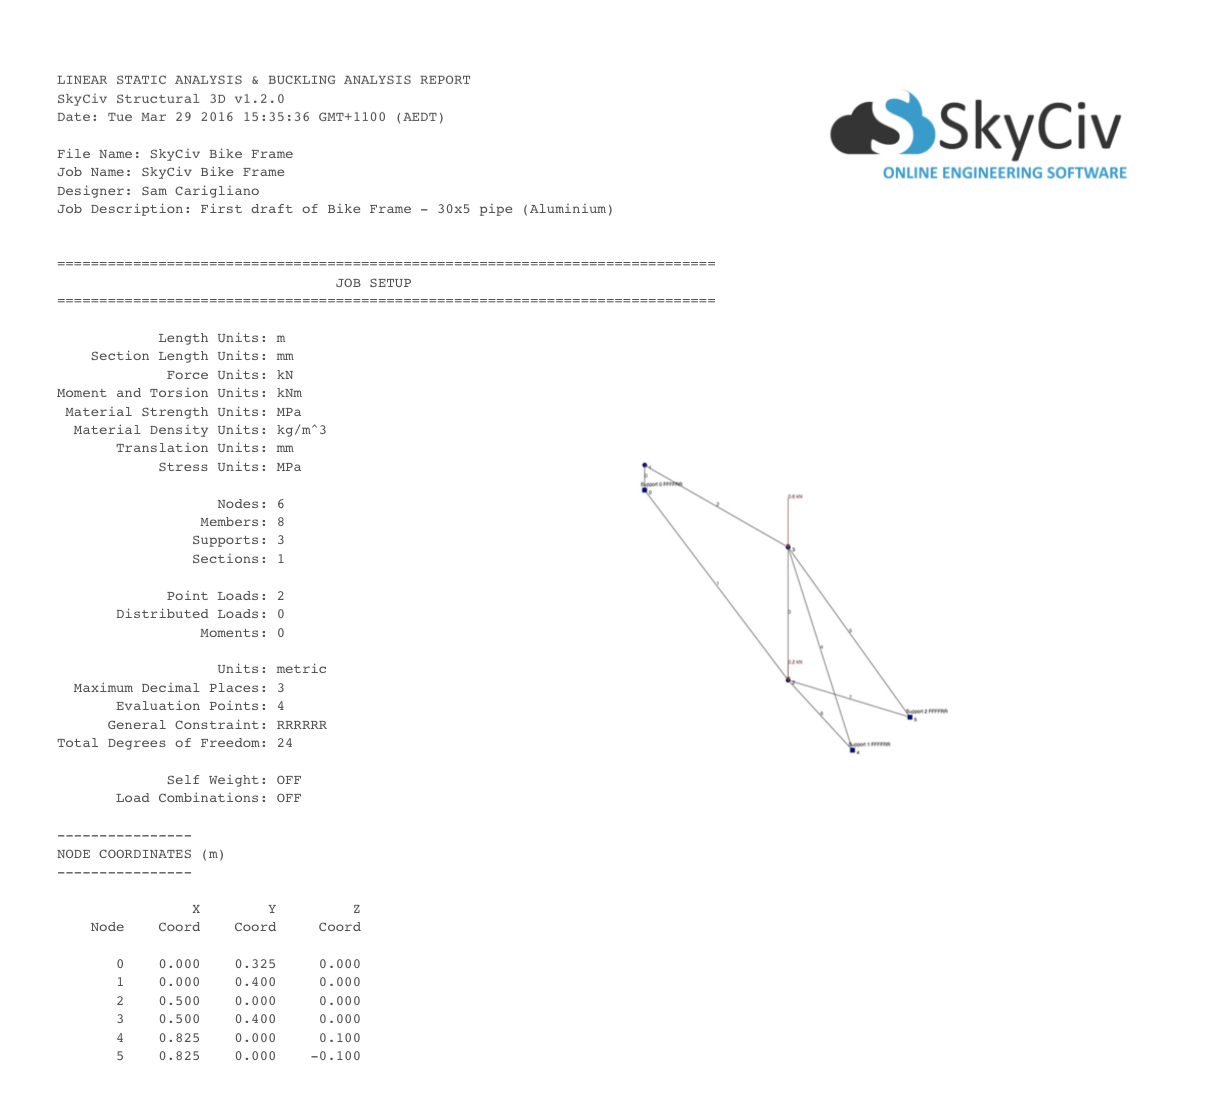 Free online truss calculator skyciv cloud engineering software calculator pooptronica Gallery